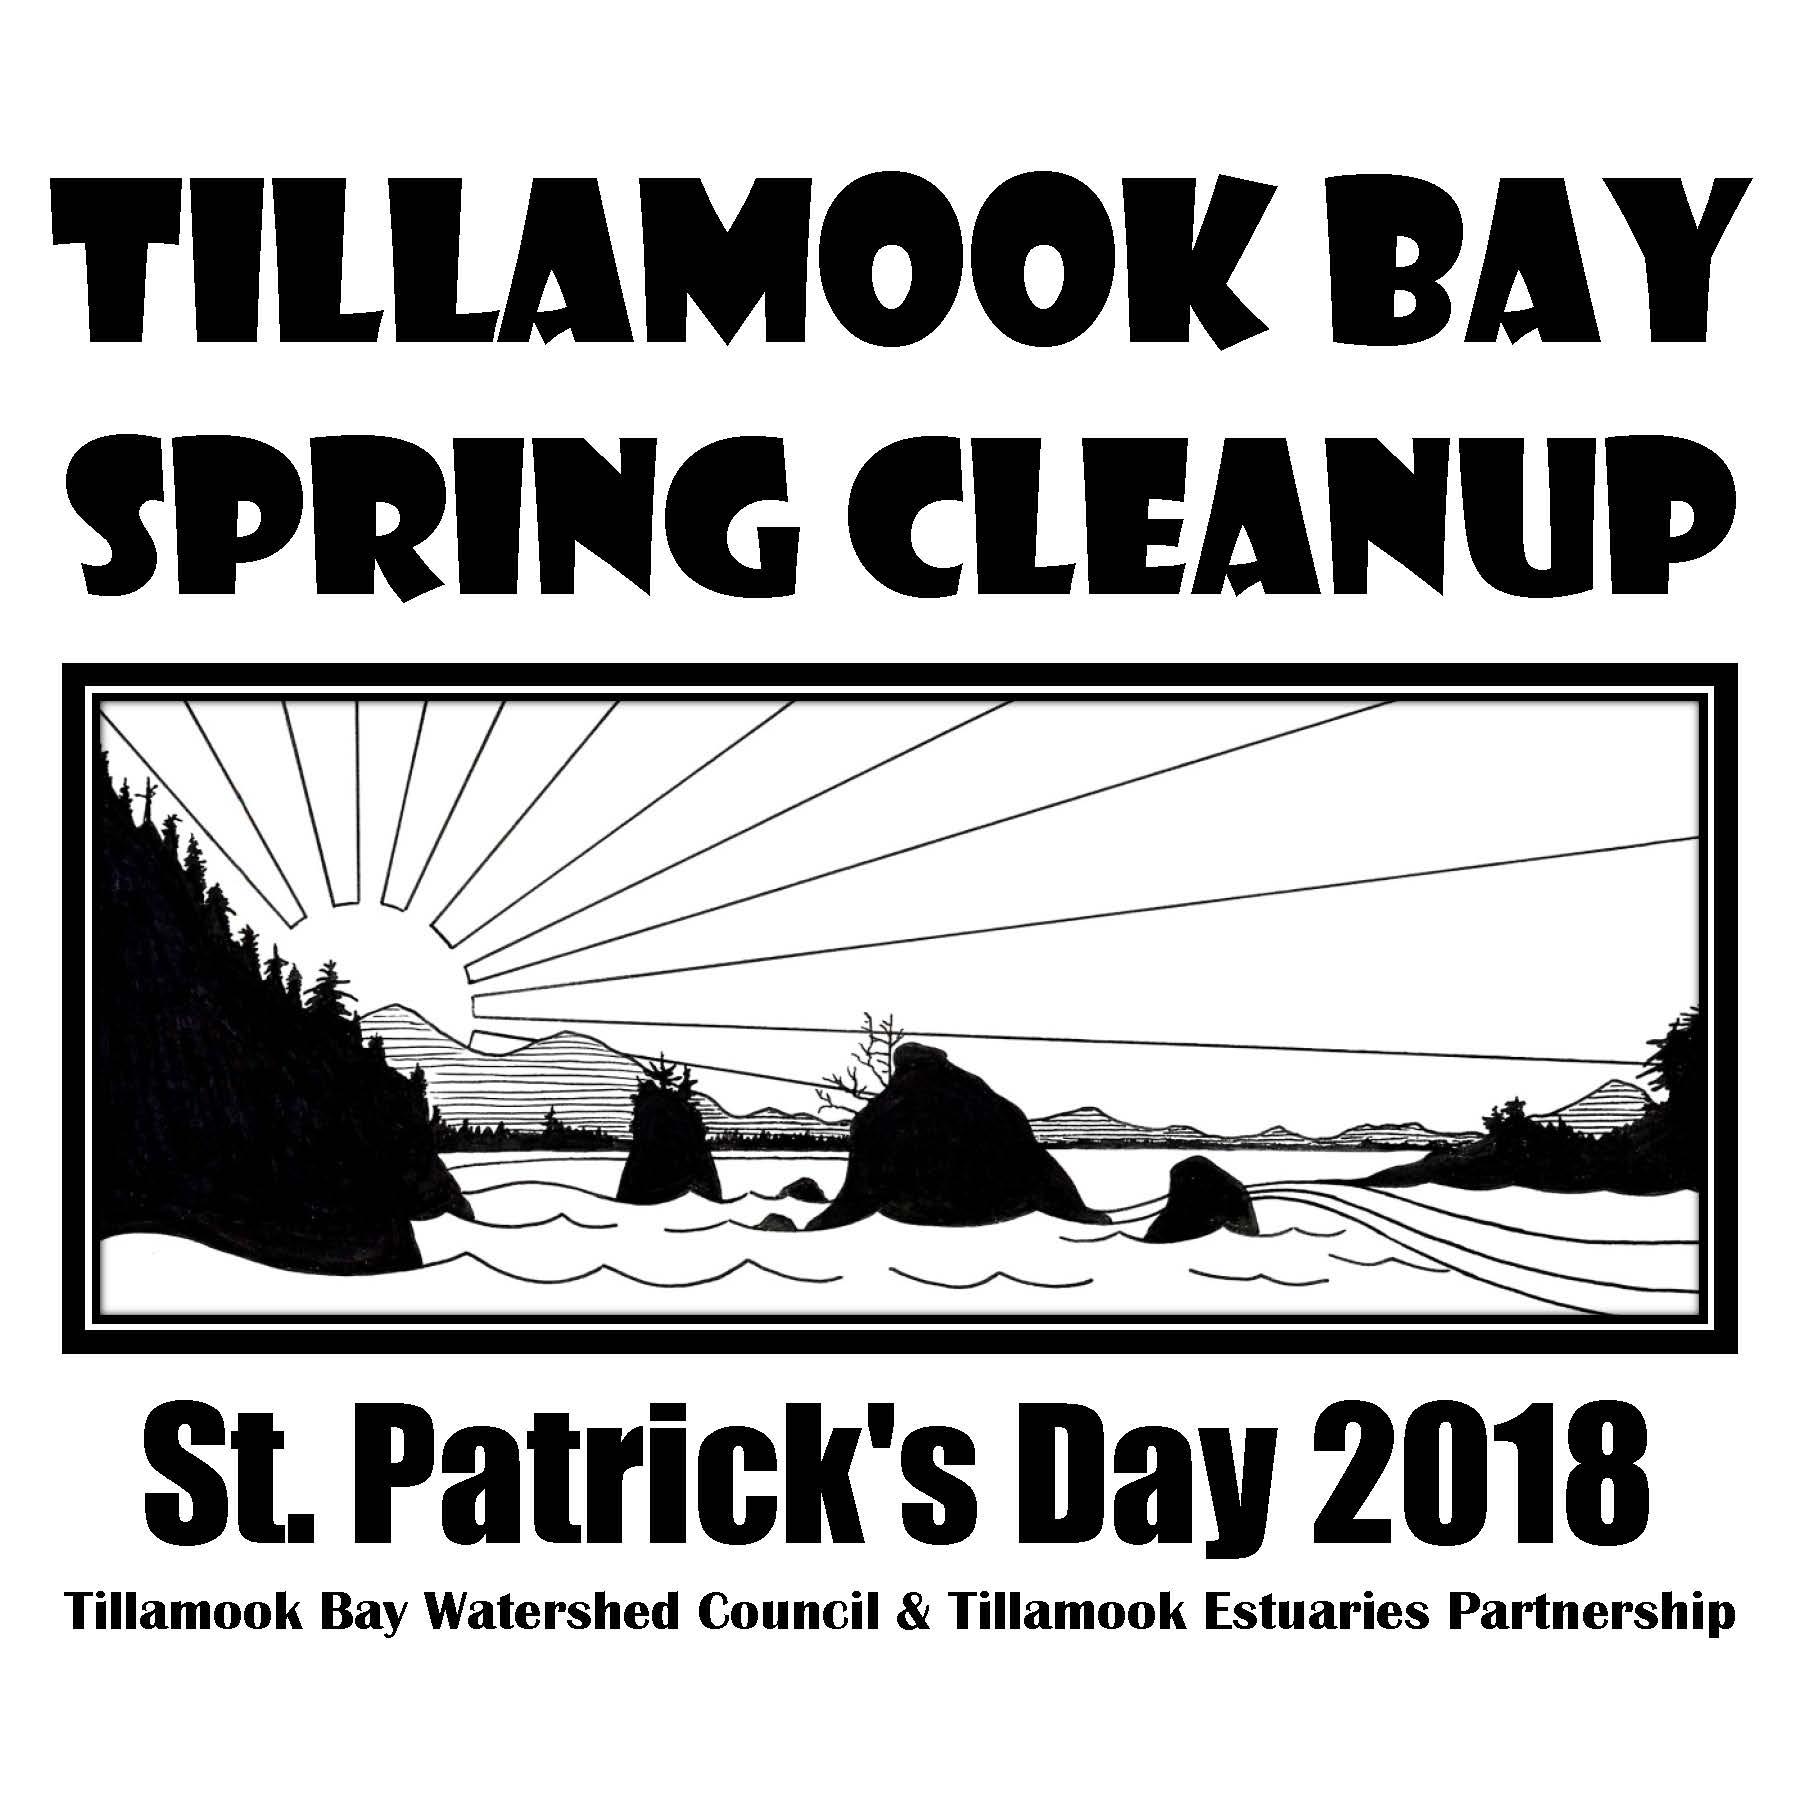 TB Cleanup Shirt Design 2018